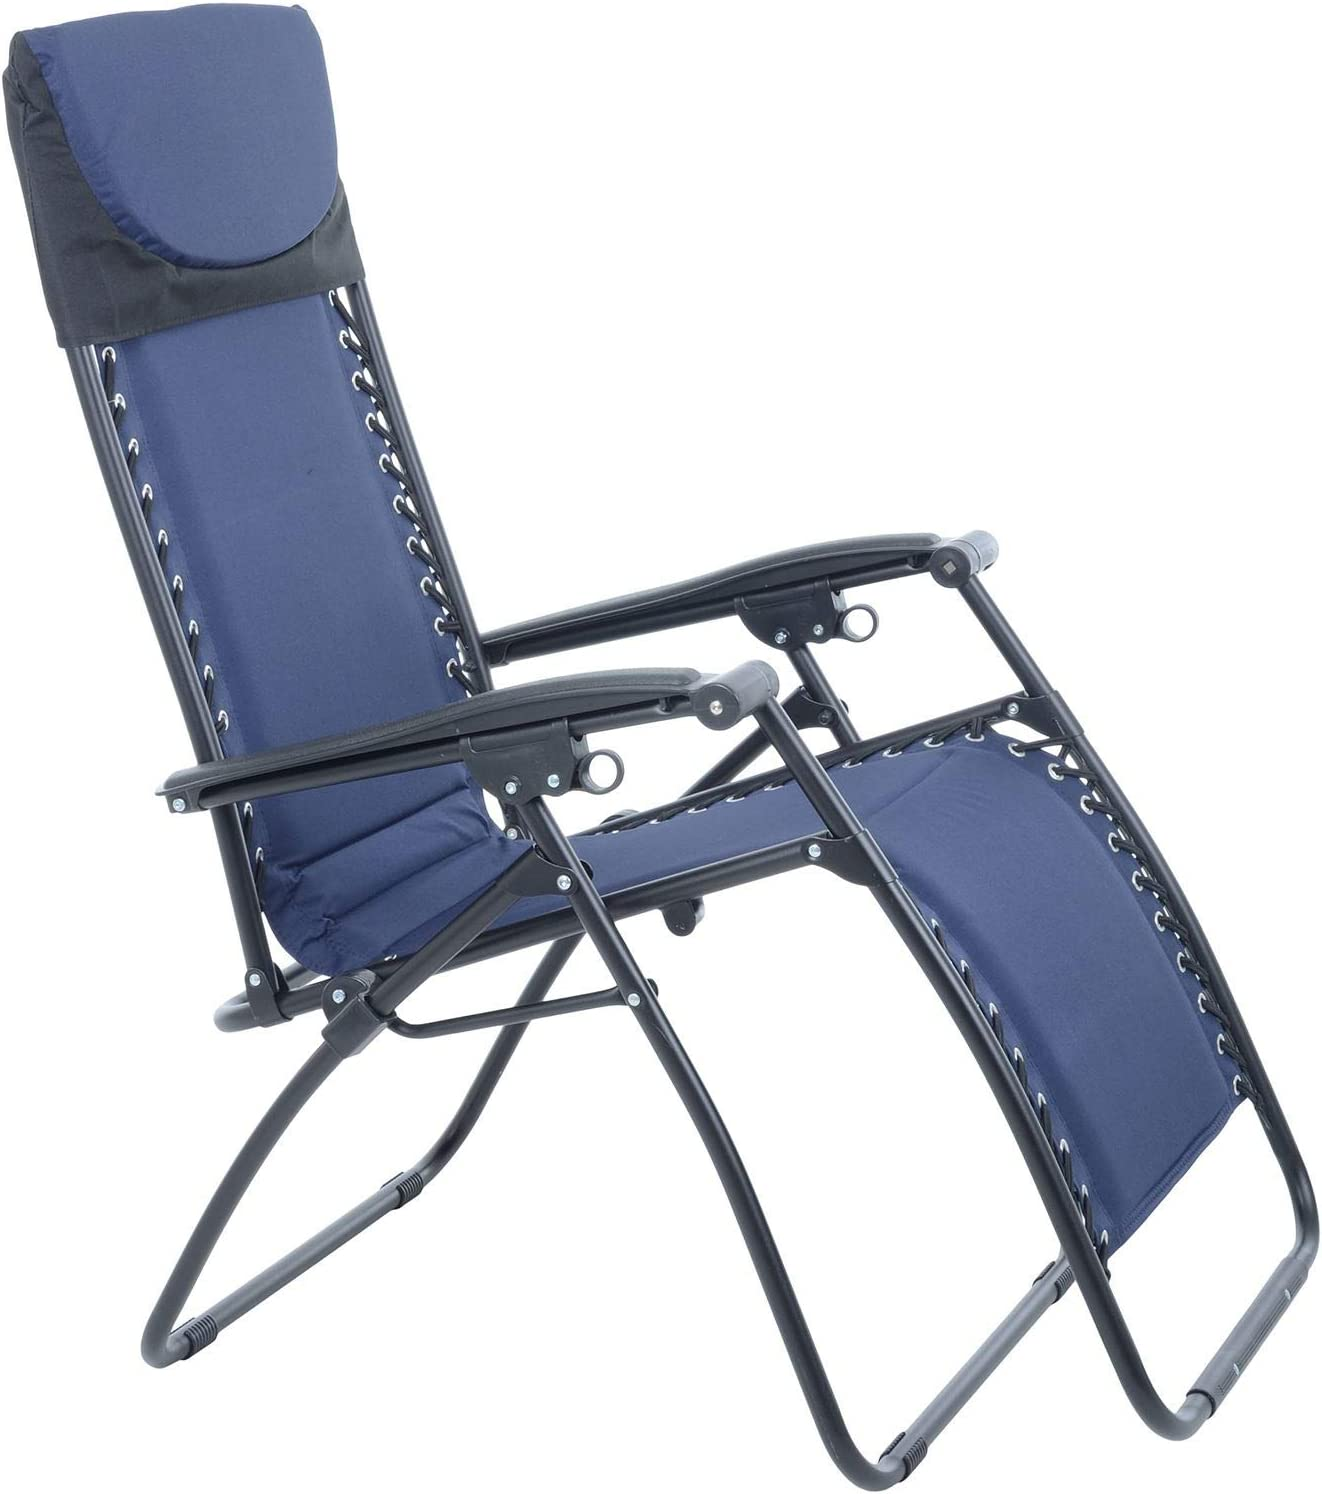 Azuma Garden Chair Navy Blue Padded Zero Gravity Relaxer